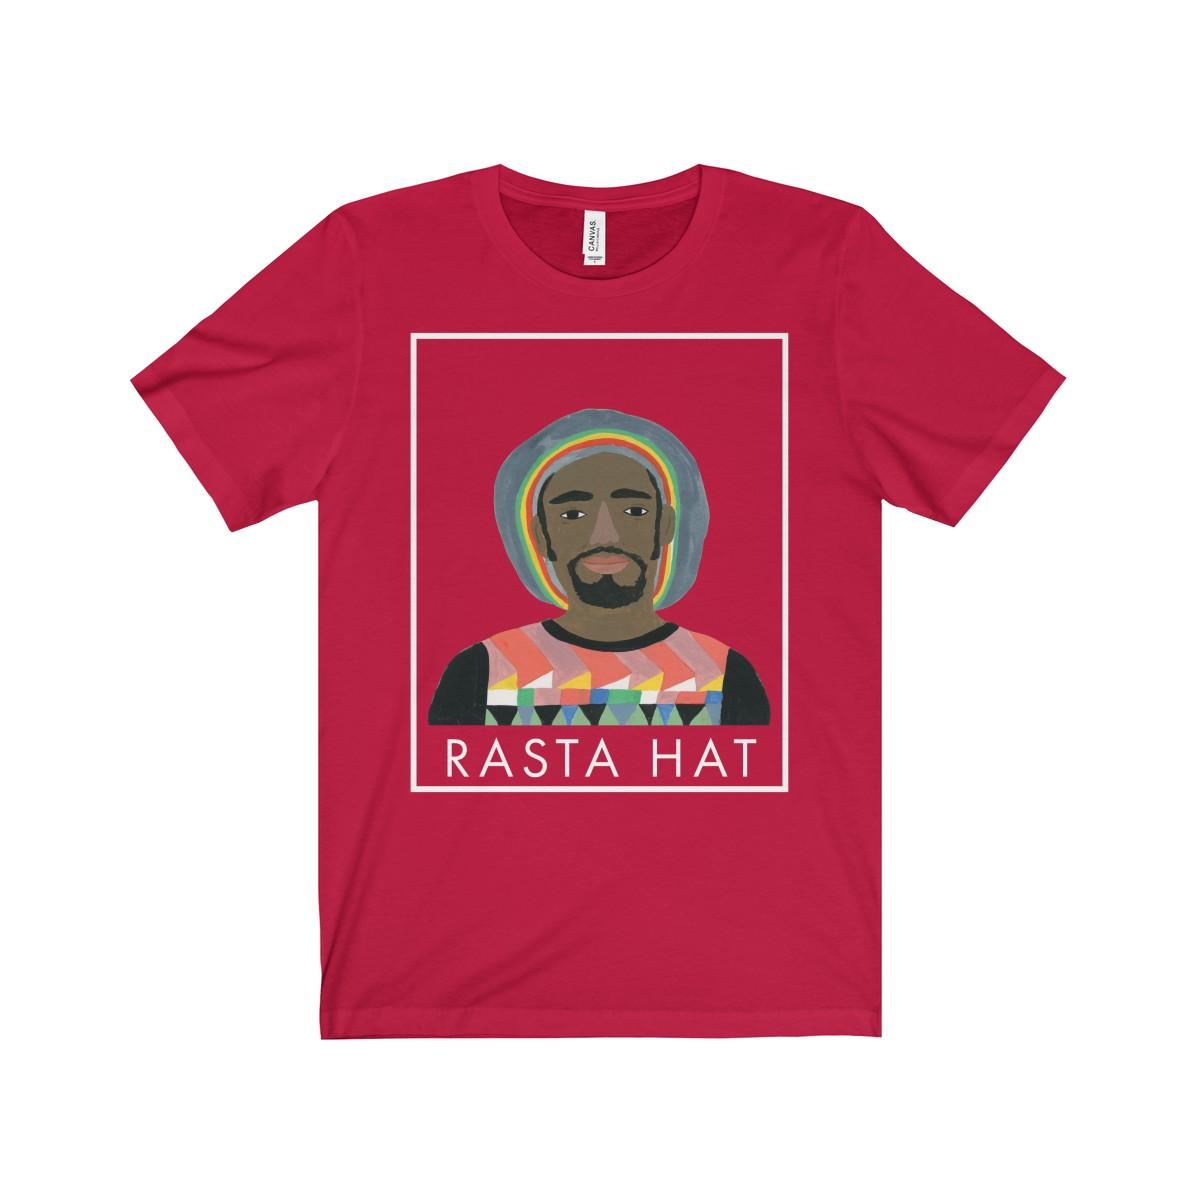 Rasta Cap Adult T-shirt - Hats of Faith 910d5a919f6f3